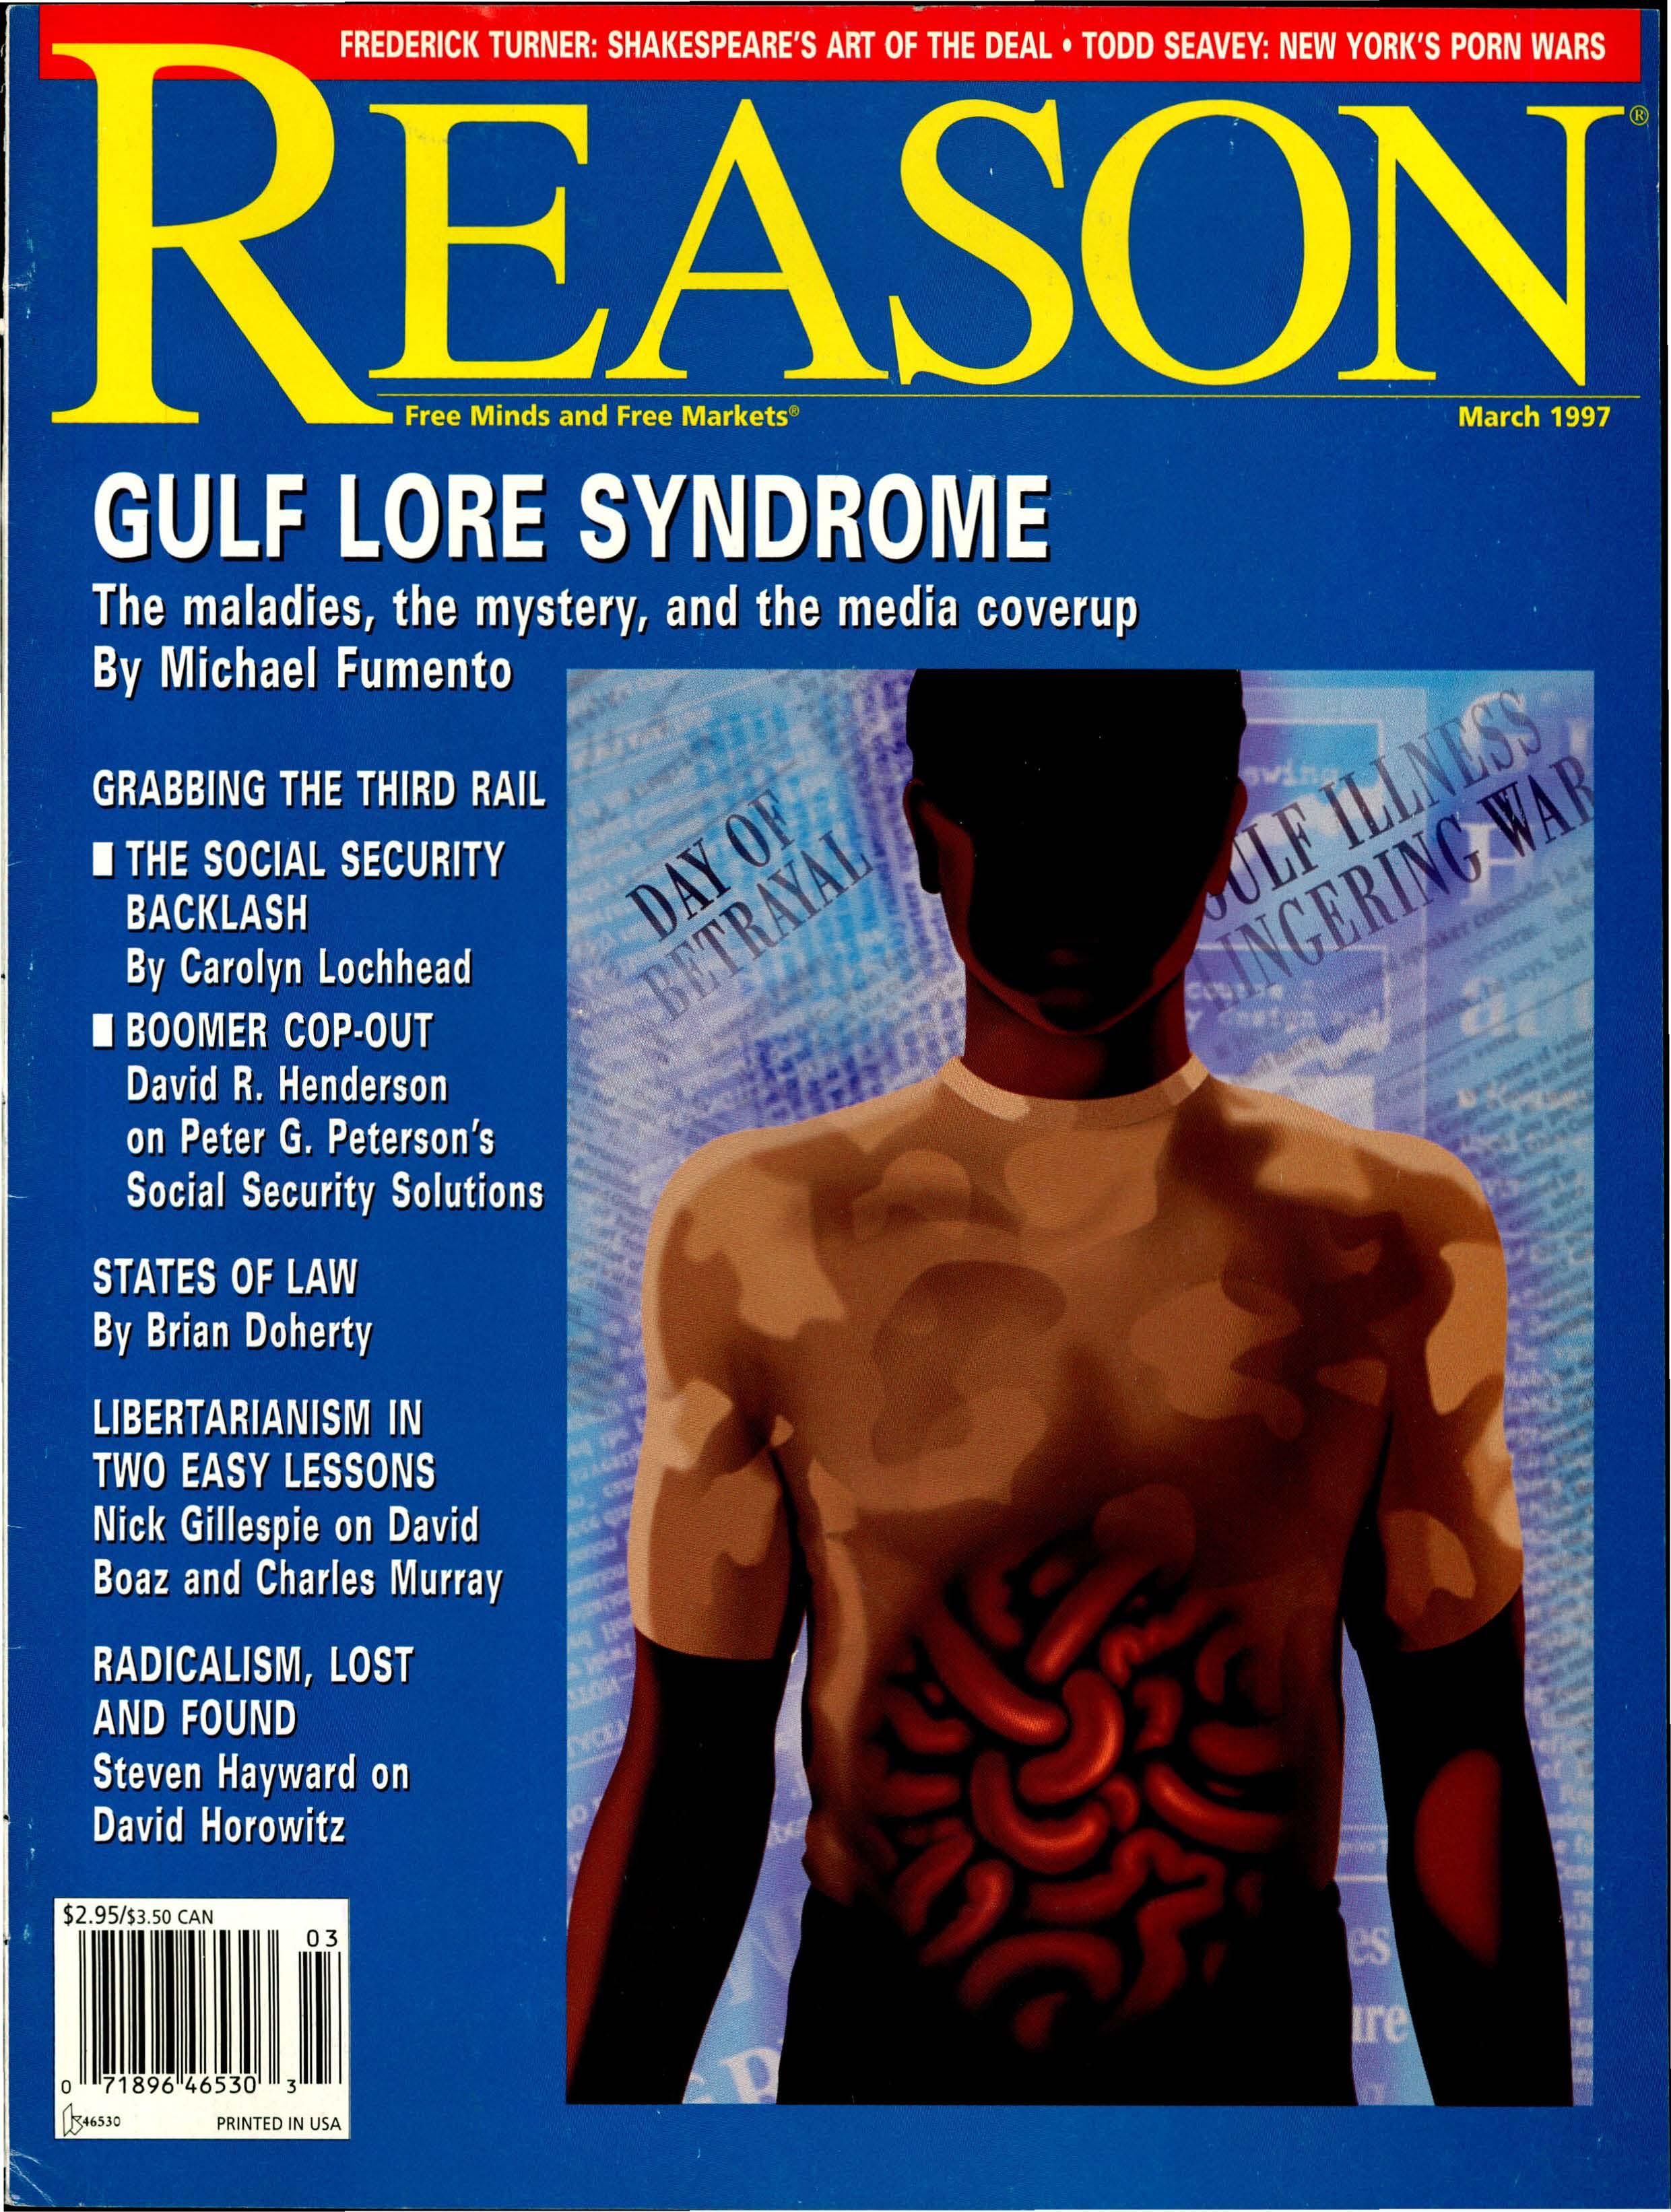 Reason Magazine, March 1997 cover image